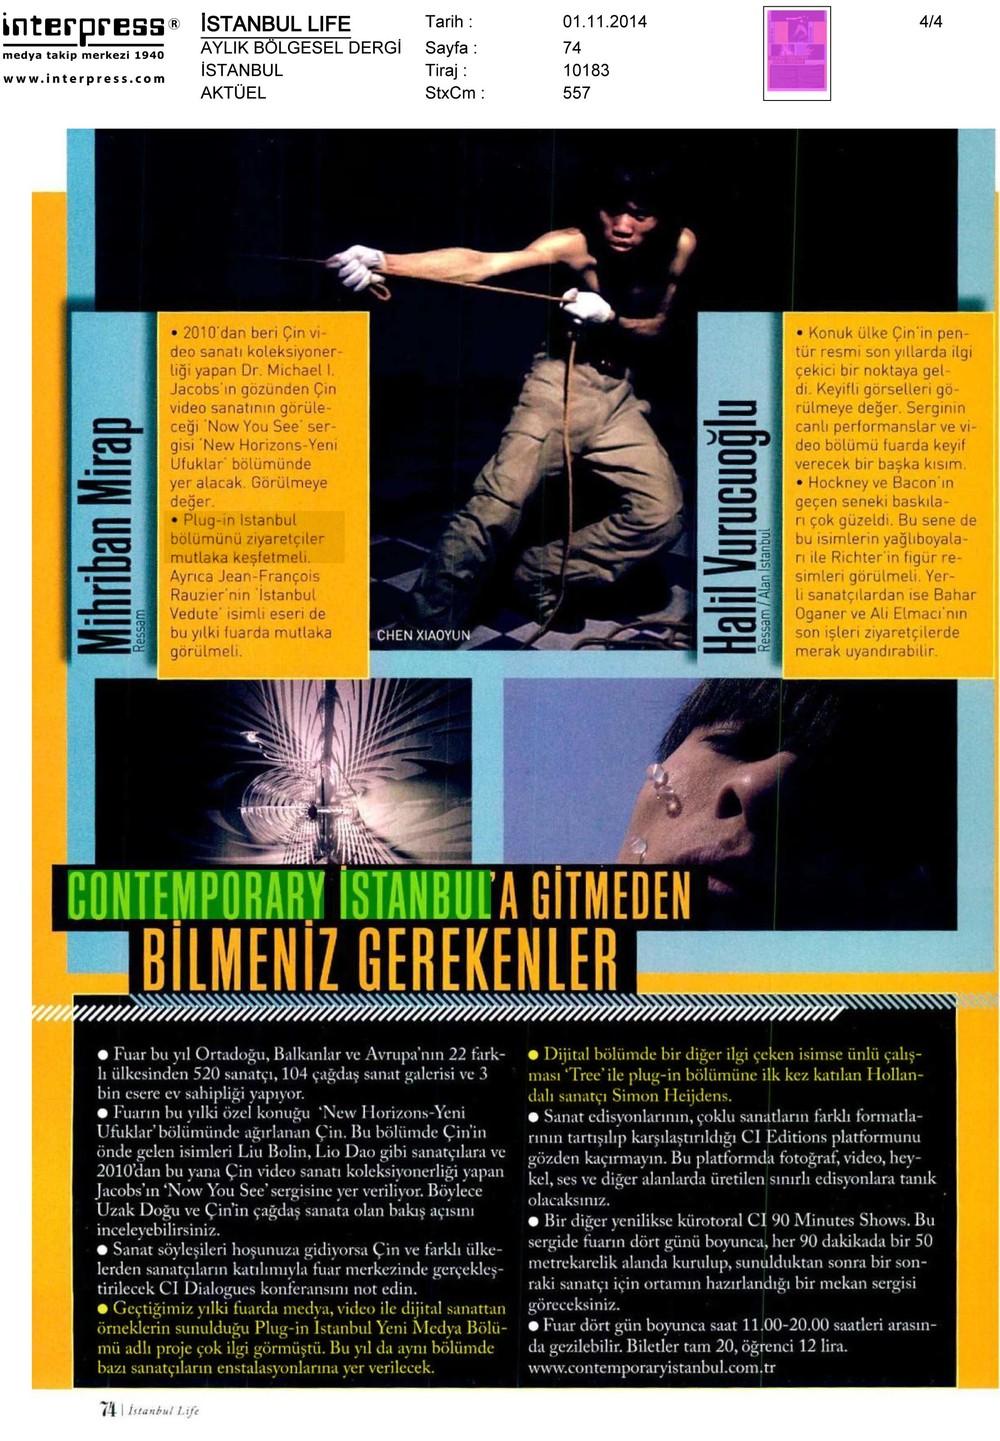 Istanbuk Life - Aylık Bölgesel Dergi 03-11-4.jpg